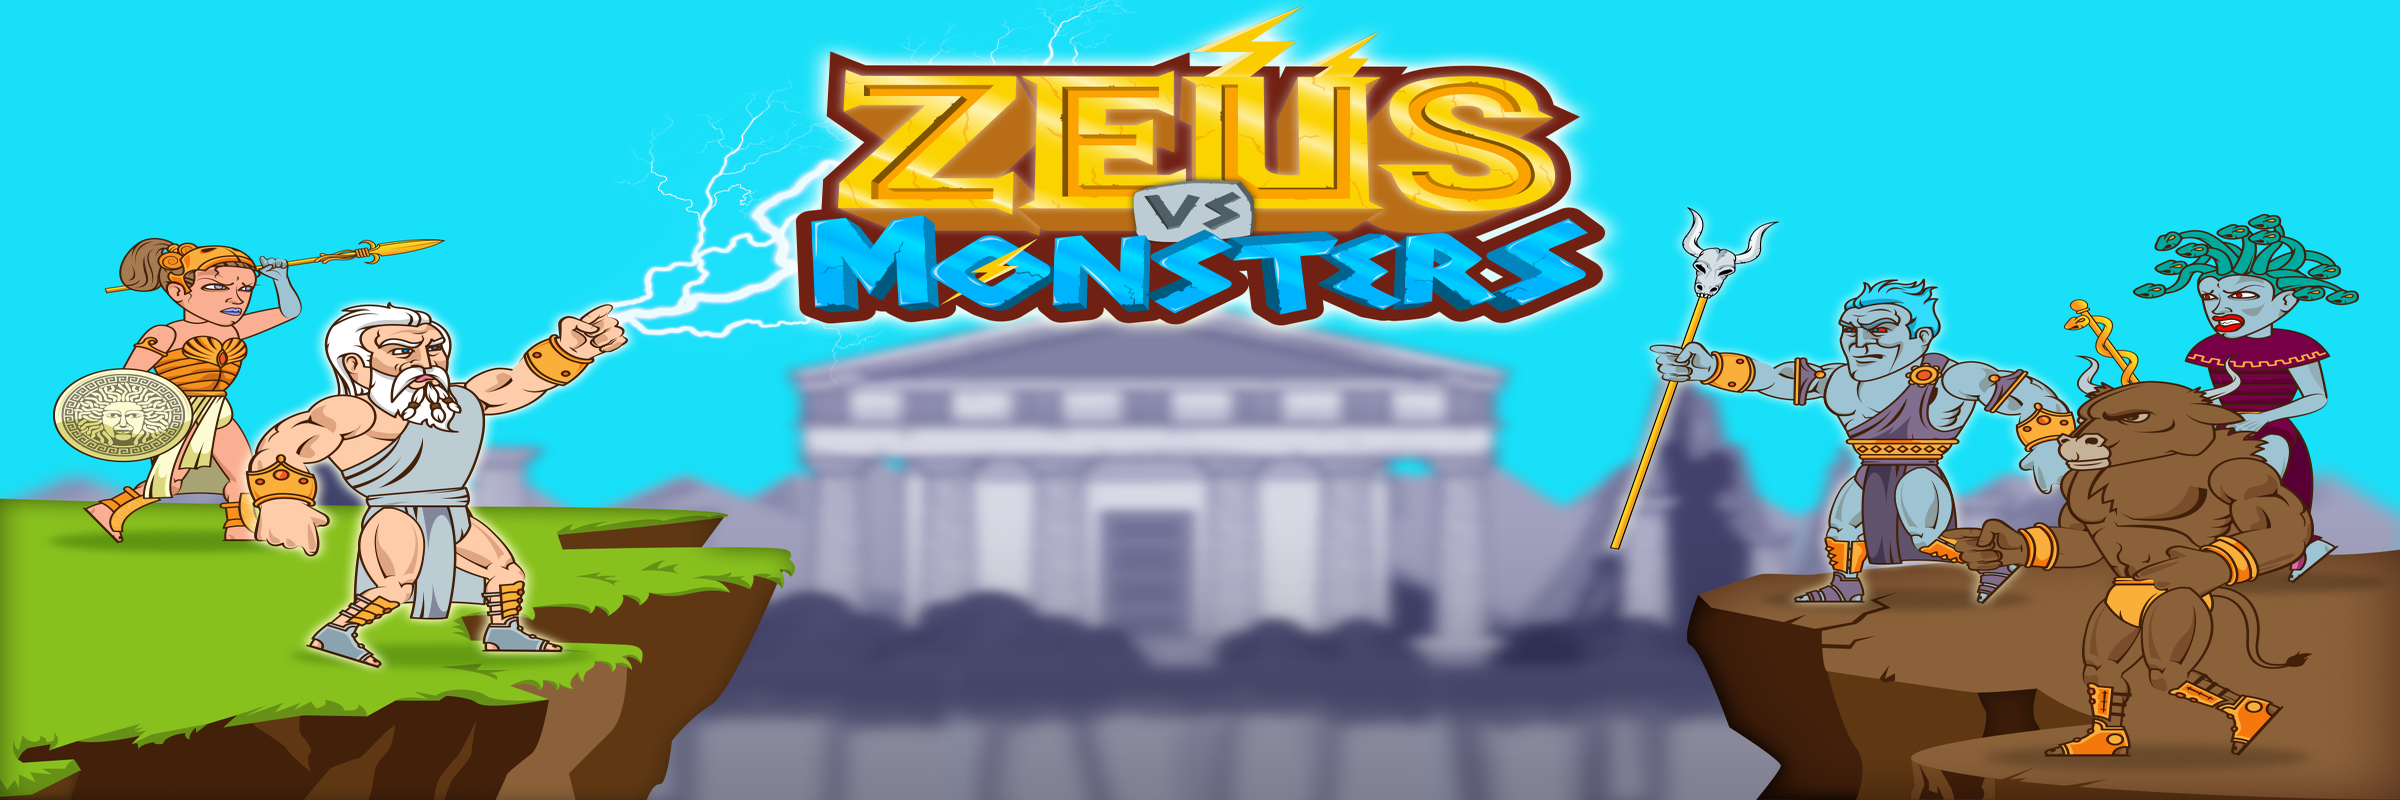 Zeus vs Monsters - Math Game